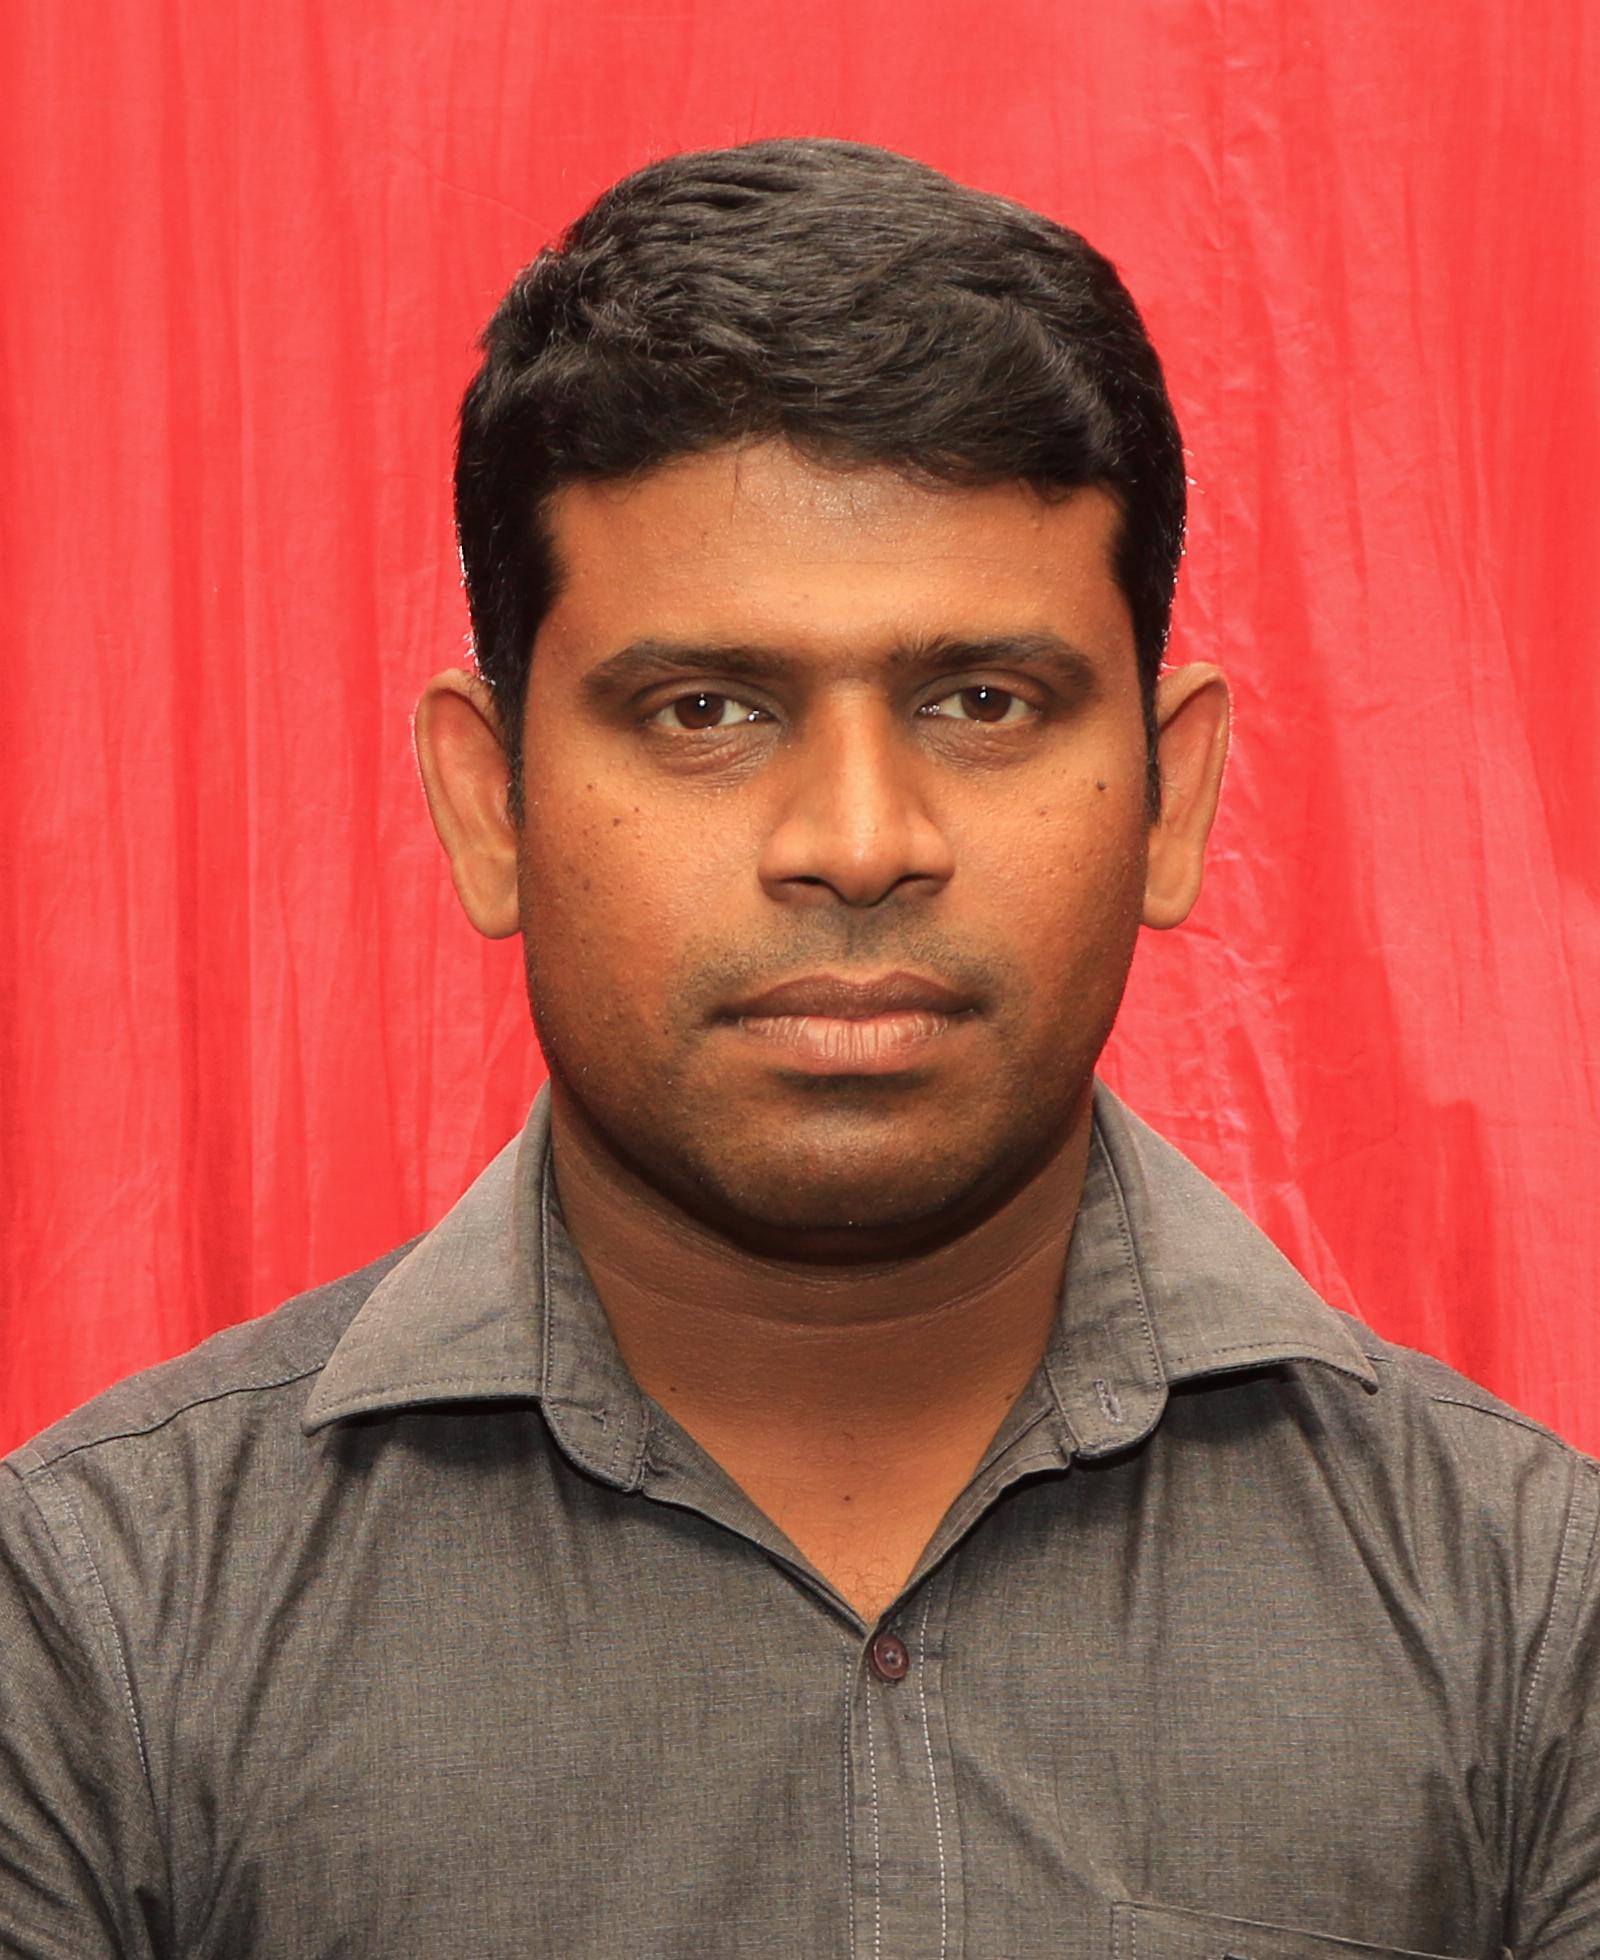 Mr. GAGN Subasinghe